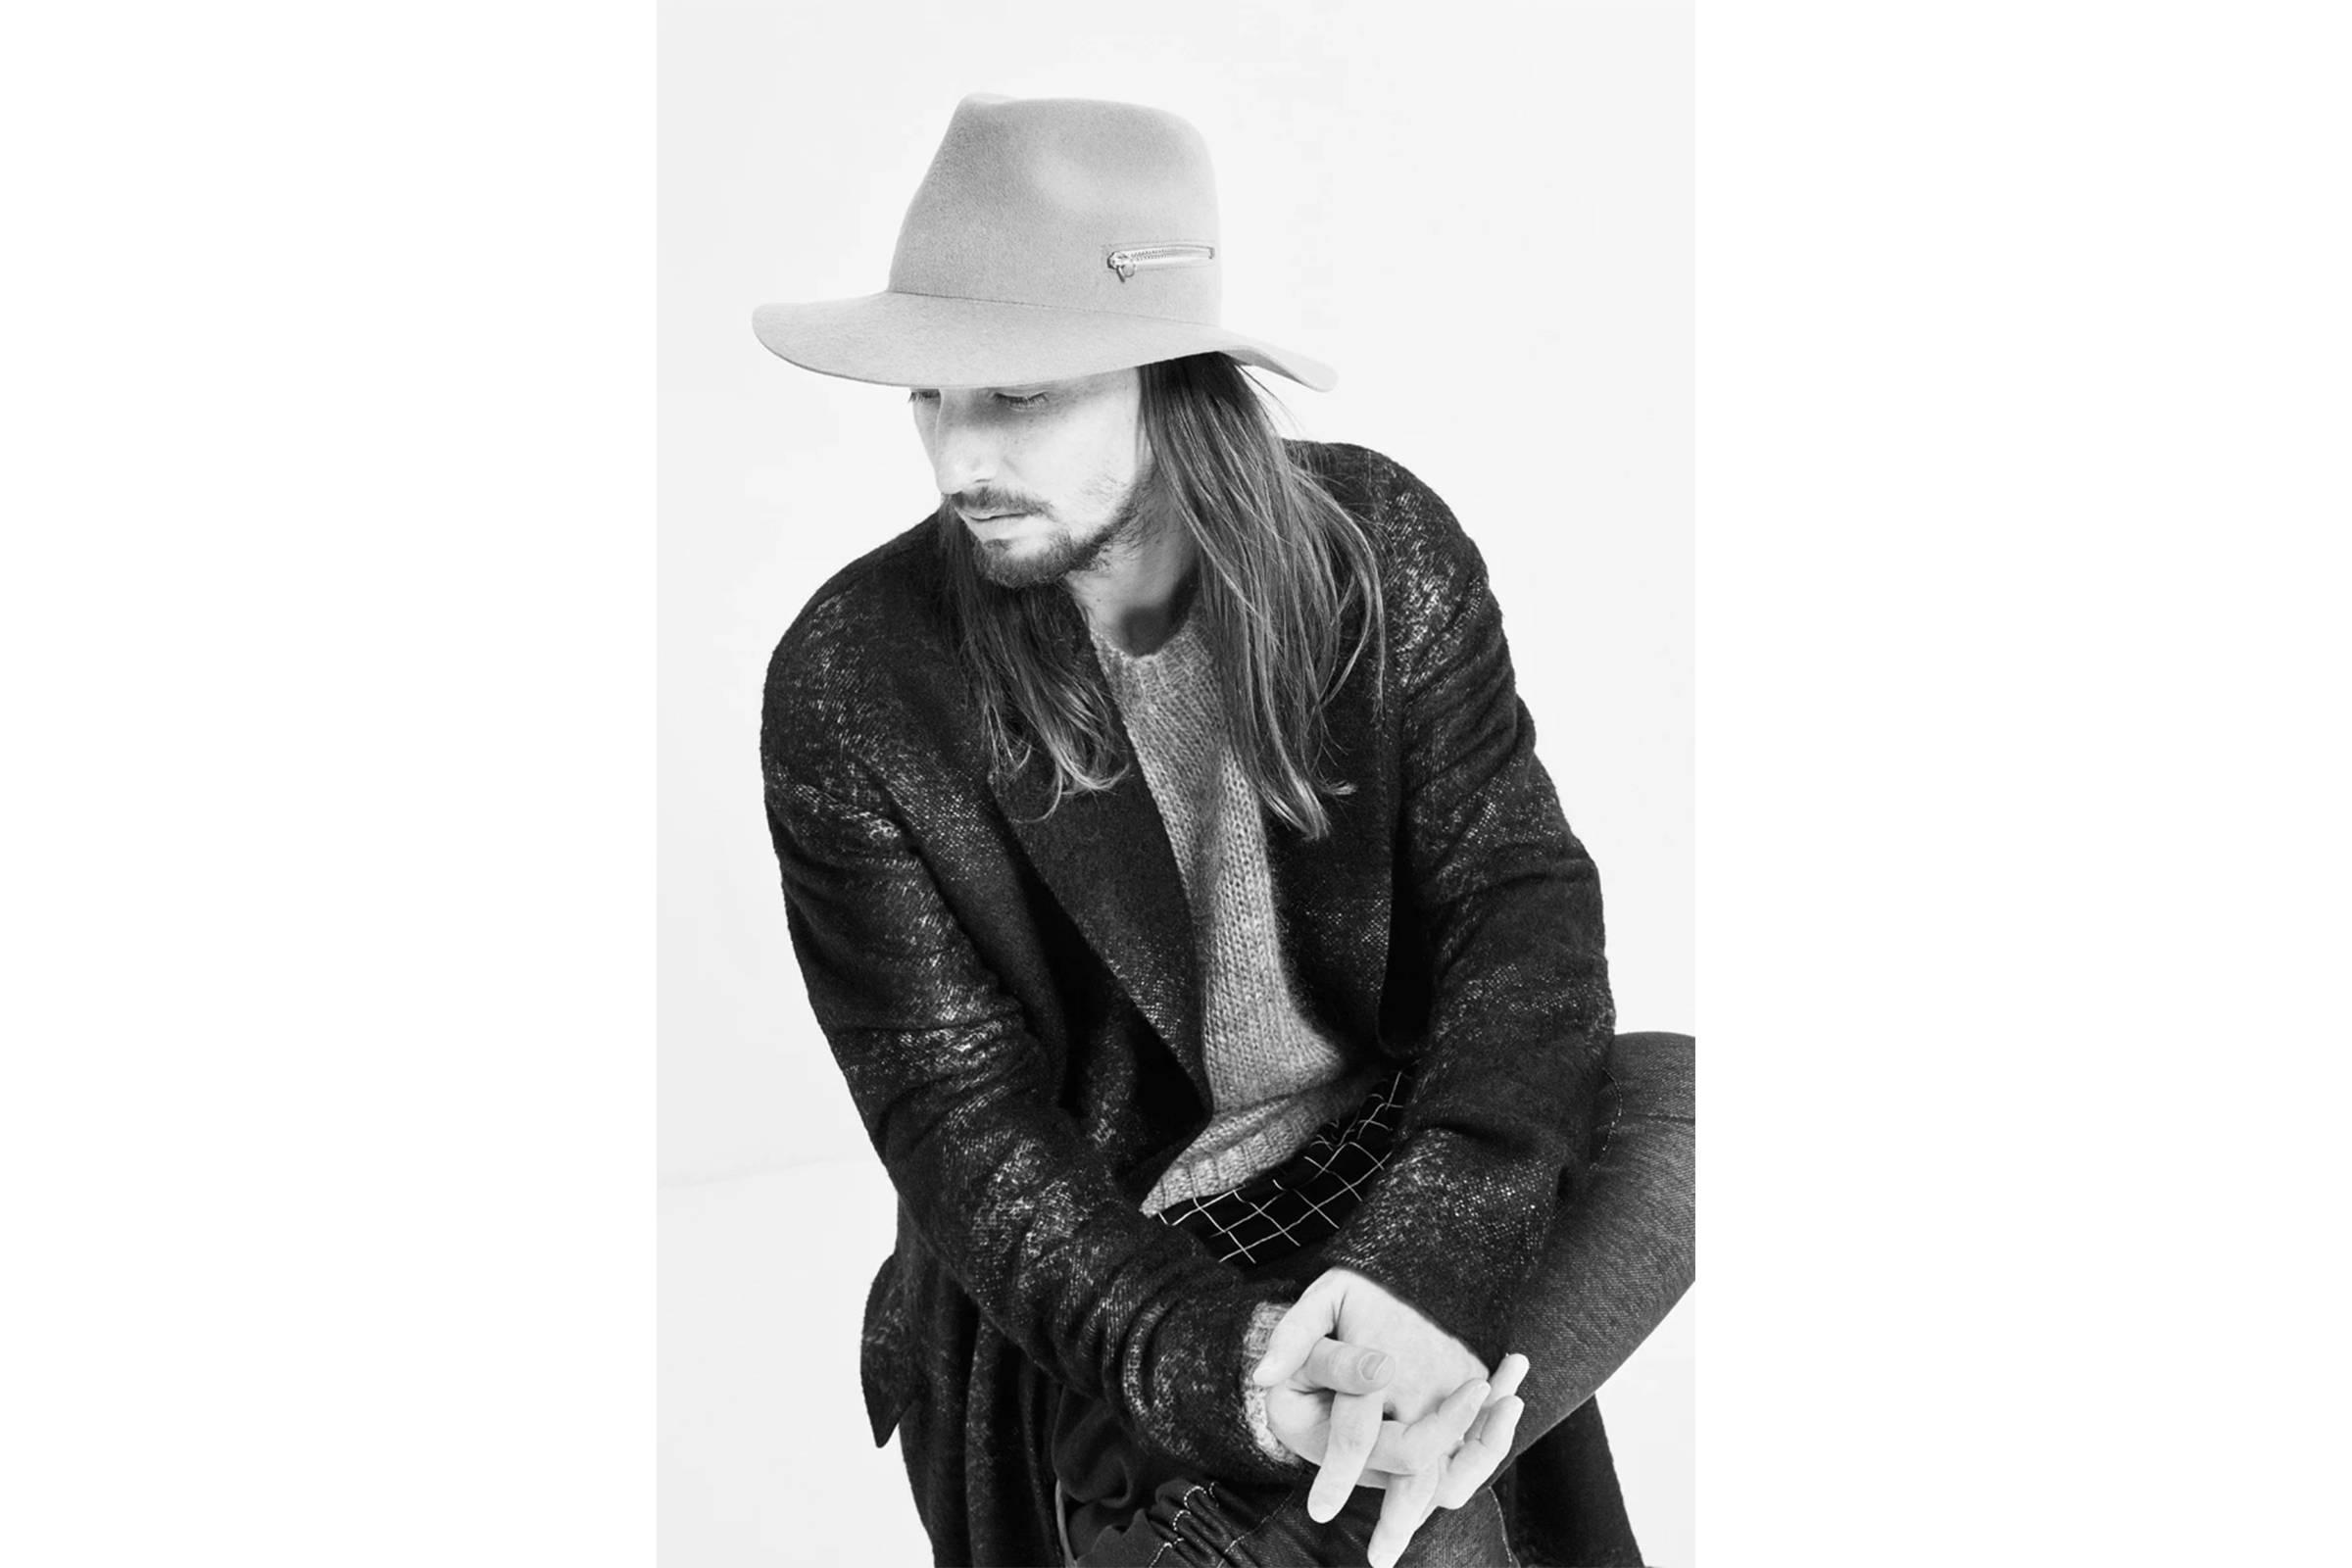 A Grown Man Hat